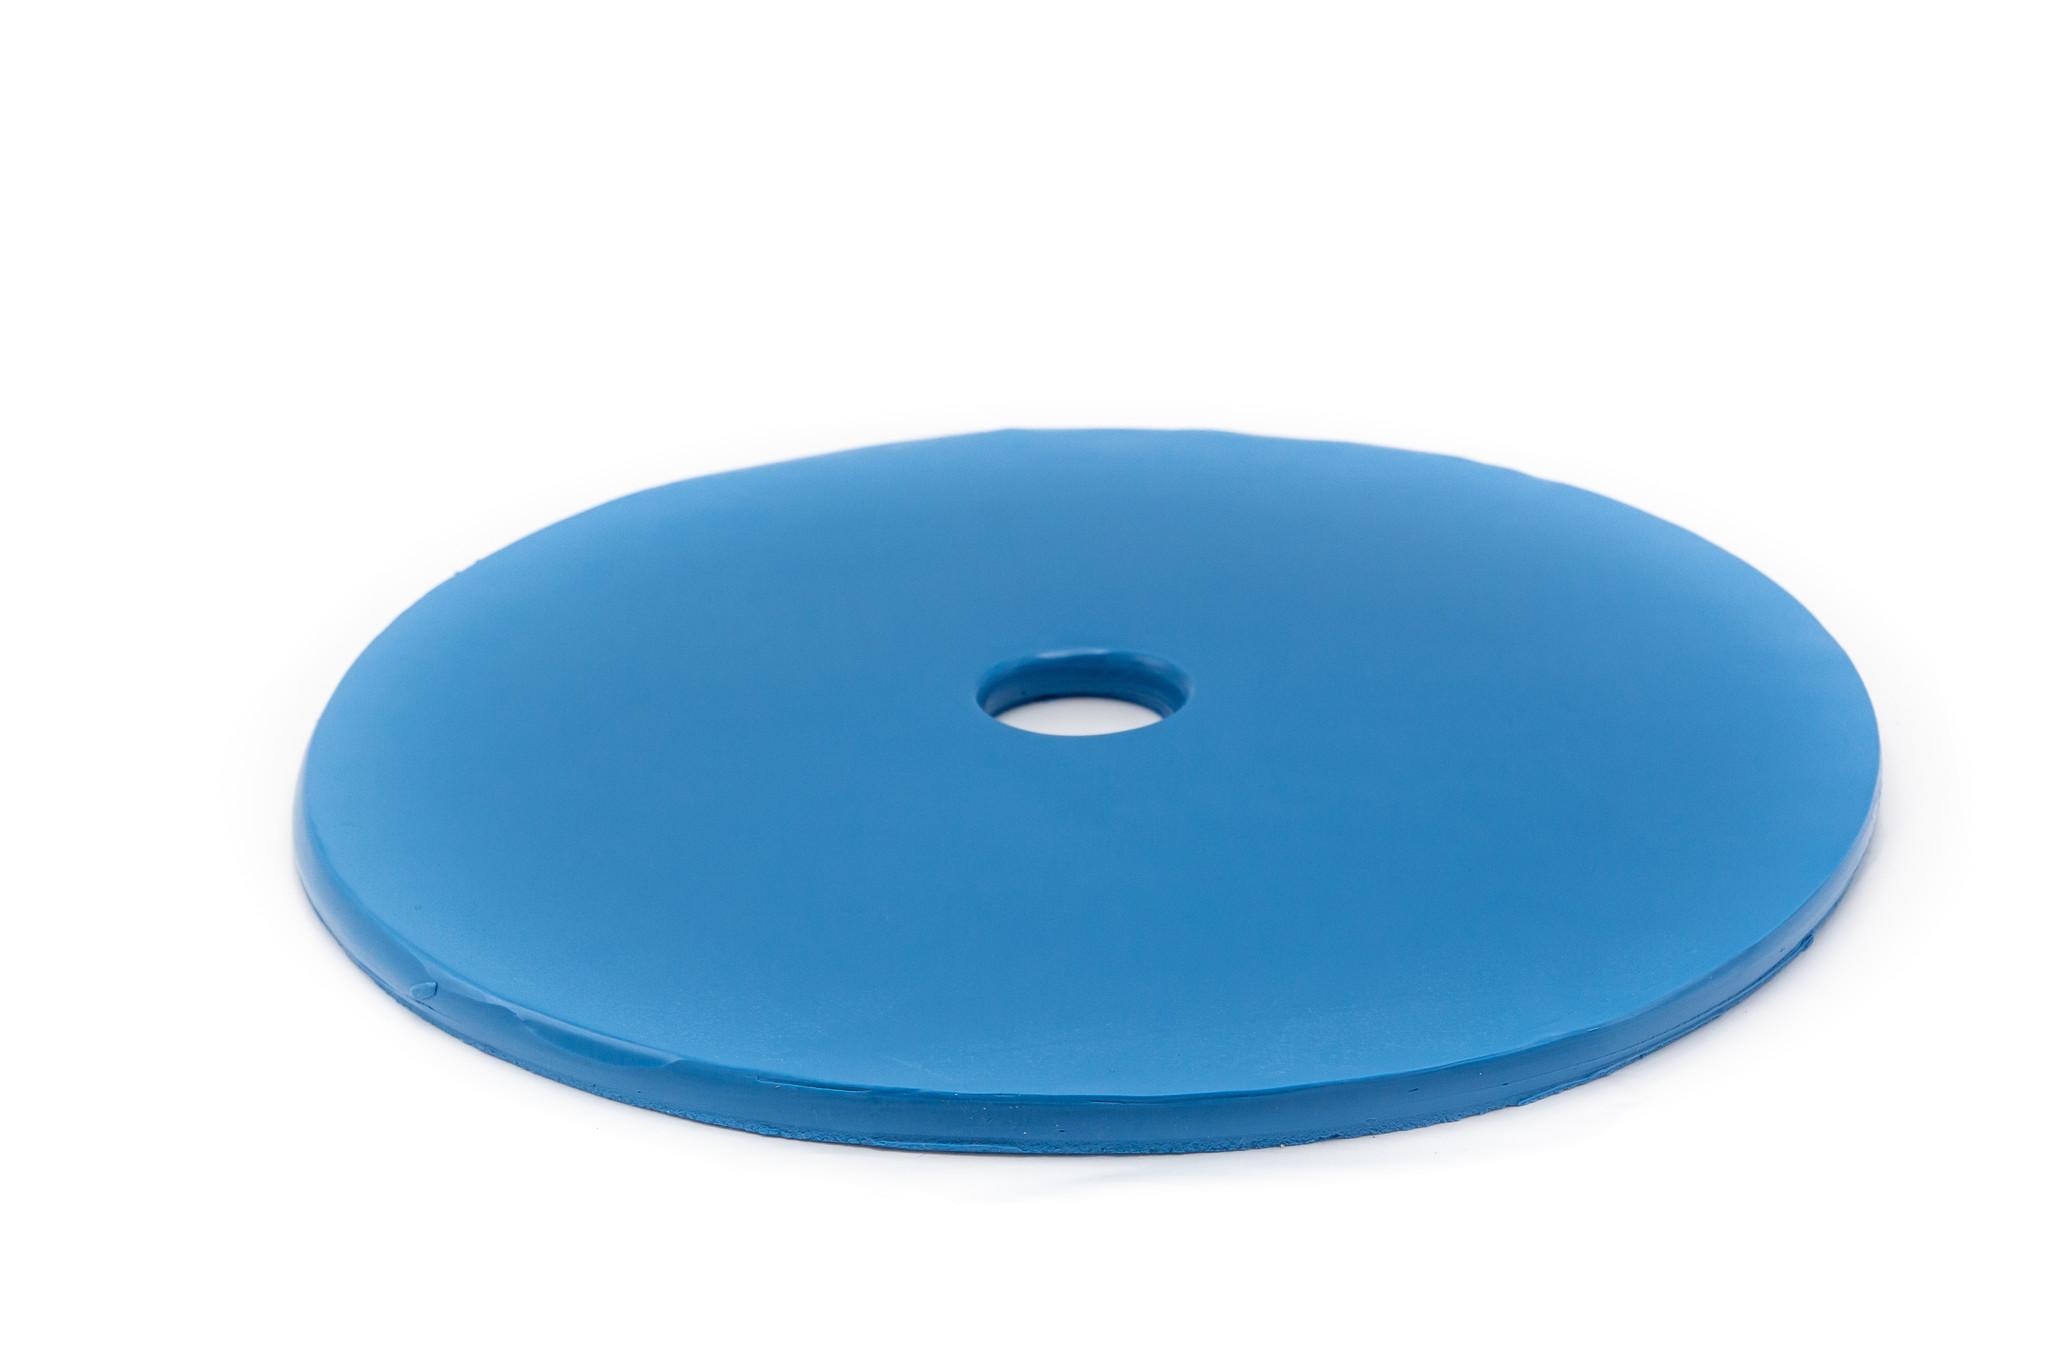 DTR Blauwe  Silicone - Nicem  180°  50 sh 1+1 schijf